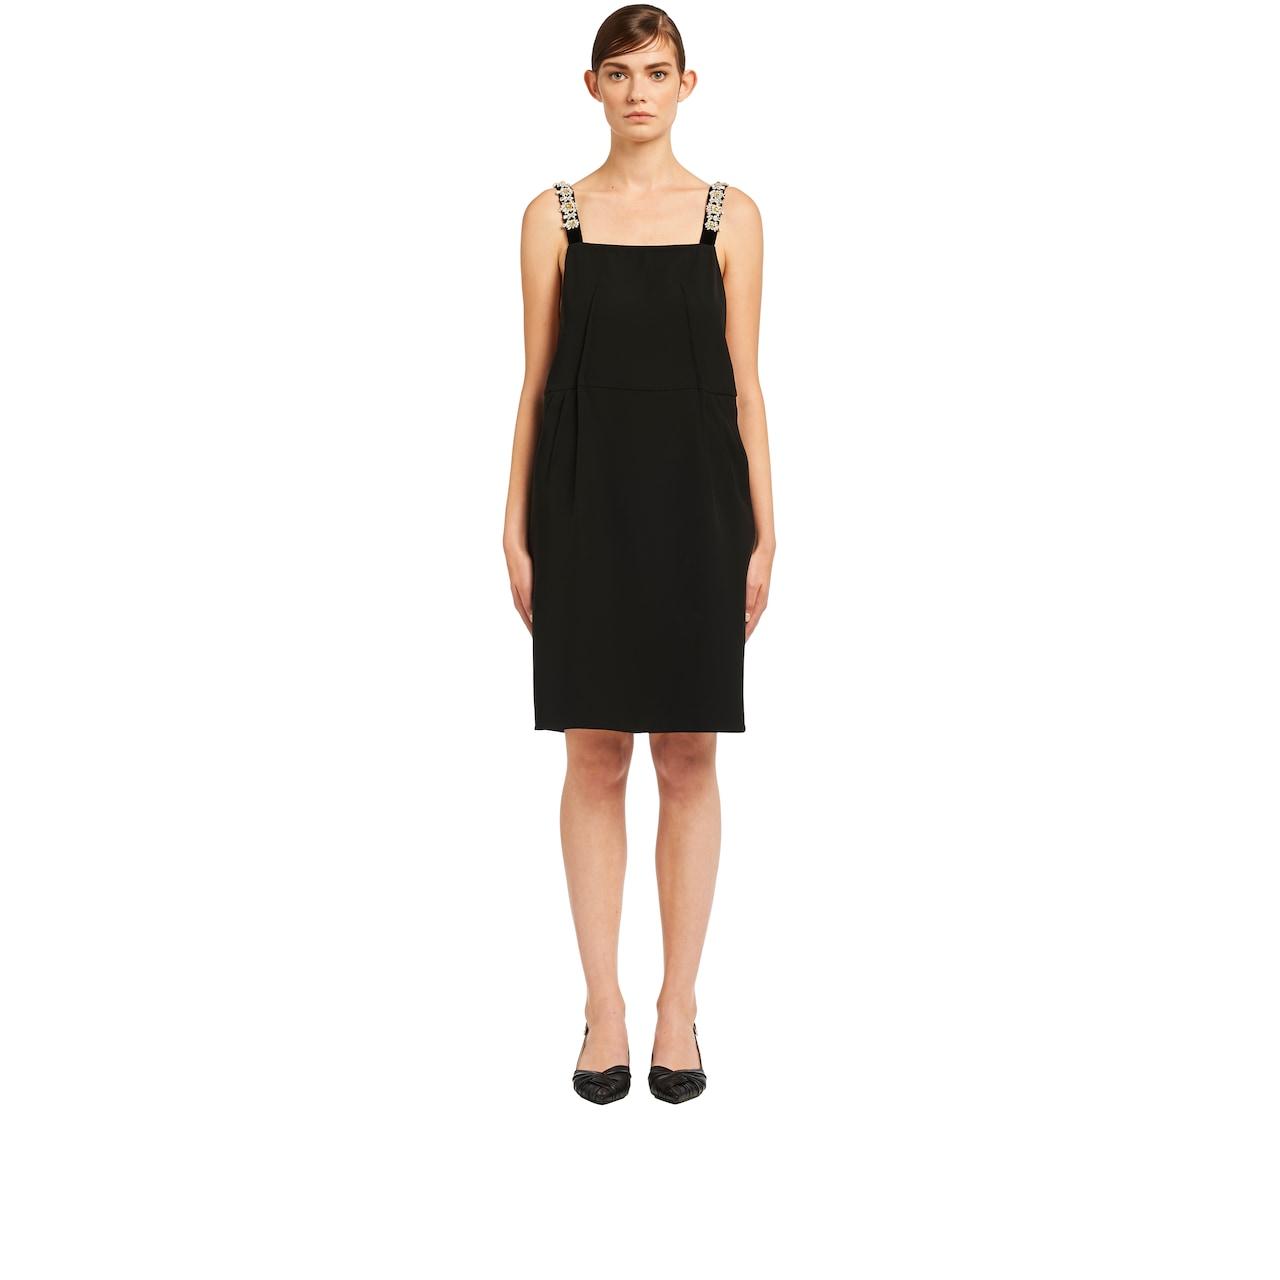 Technical fabric dress